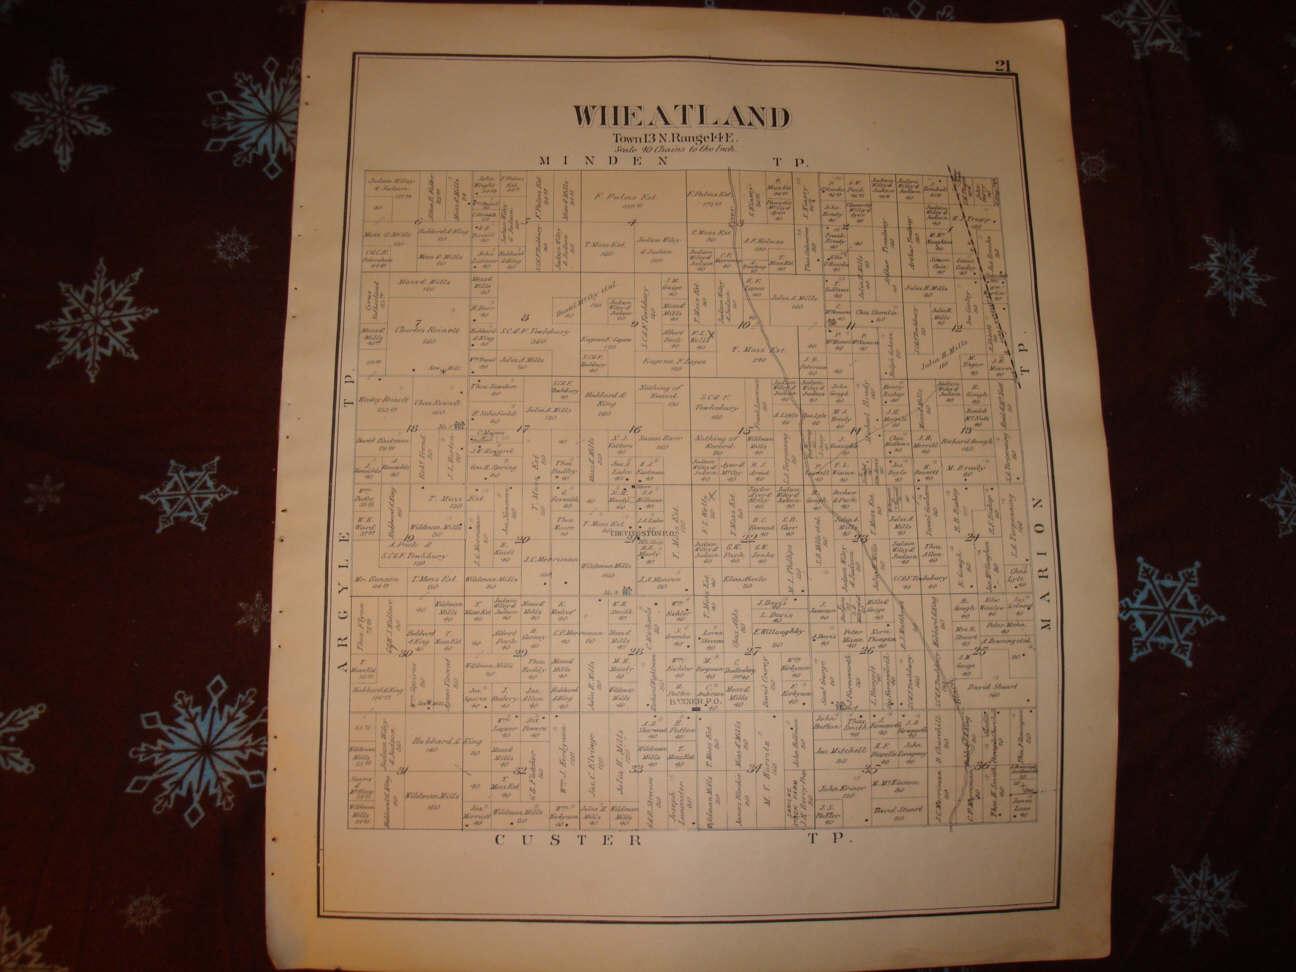 WHEATLAND TOWNSHIP SANILAC COUNTY MICHIGAN ANTIQUE MAP | eBay on erie county plat map, jackson county plat map, fulton county plat map, huron county plat map, okfuskee county plat map, saginaw county plat map, yellow medicine county plat map, kalkaska county plat map, lenawee county plat map, grant county plat map, cambria county plat map, somerset county plat map, union county plat map, gaines county plat map, lake county plat map, grand traverse county plat map, camden county plat map, ida county plat map, st clair county plat map, clayton county plat map,